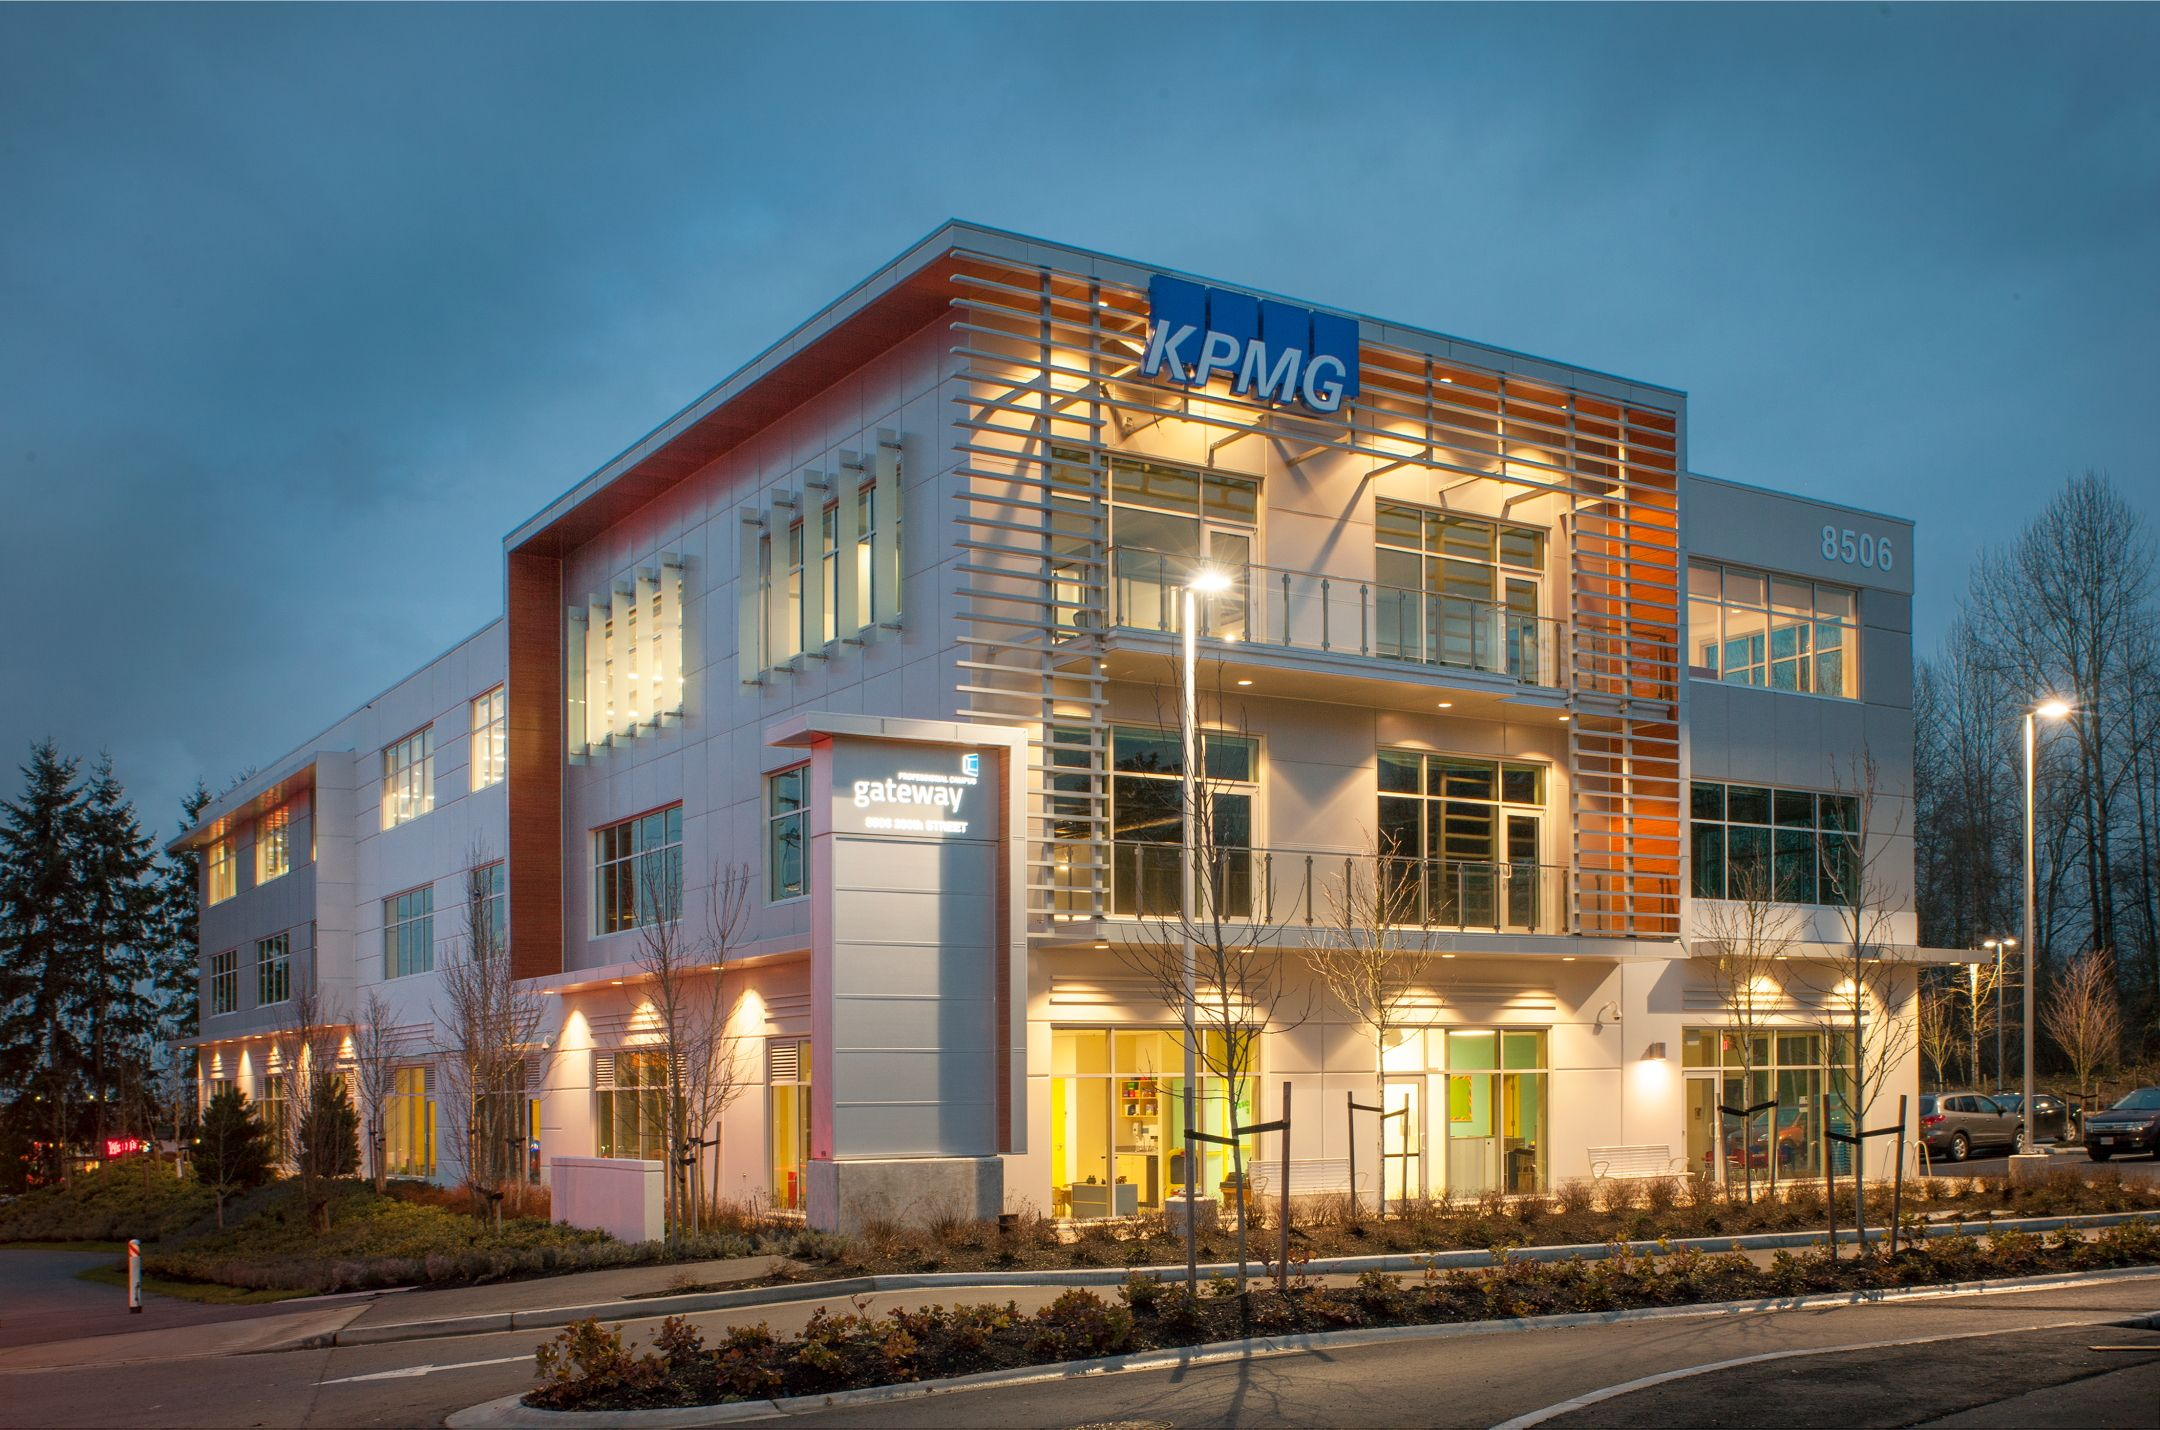 kpmg seattle office. Gateway KPMG Office Building, Langley Kpmg Seattle